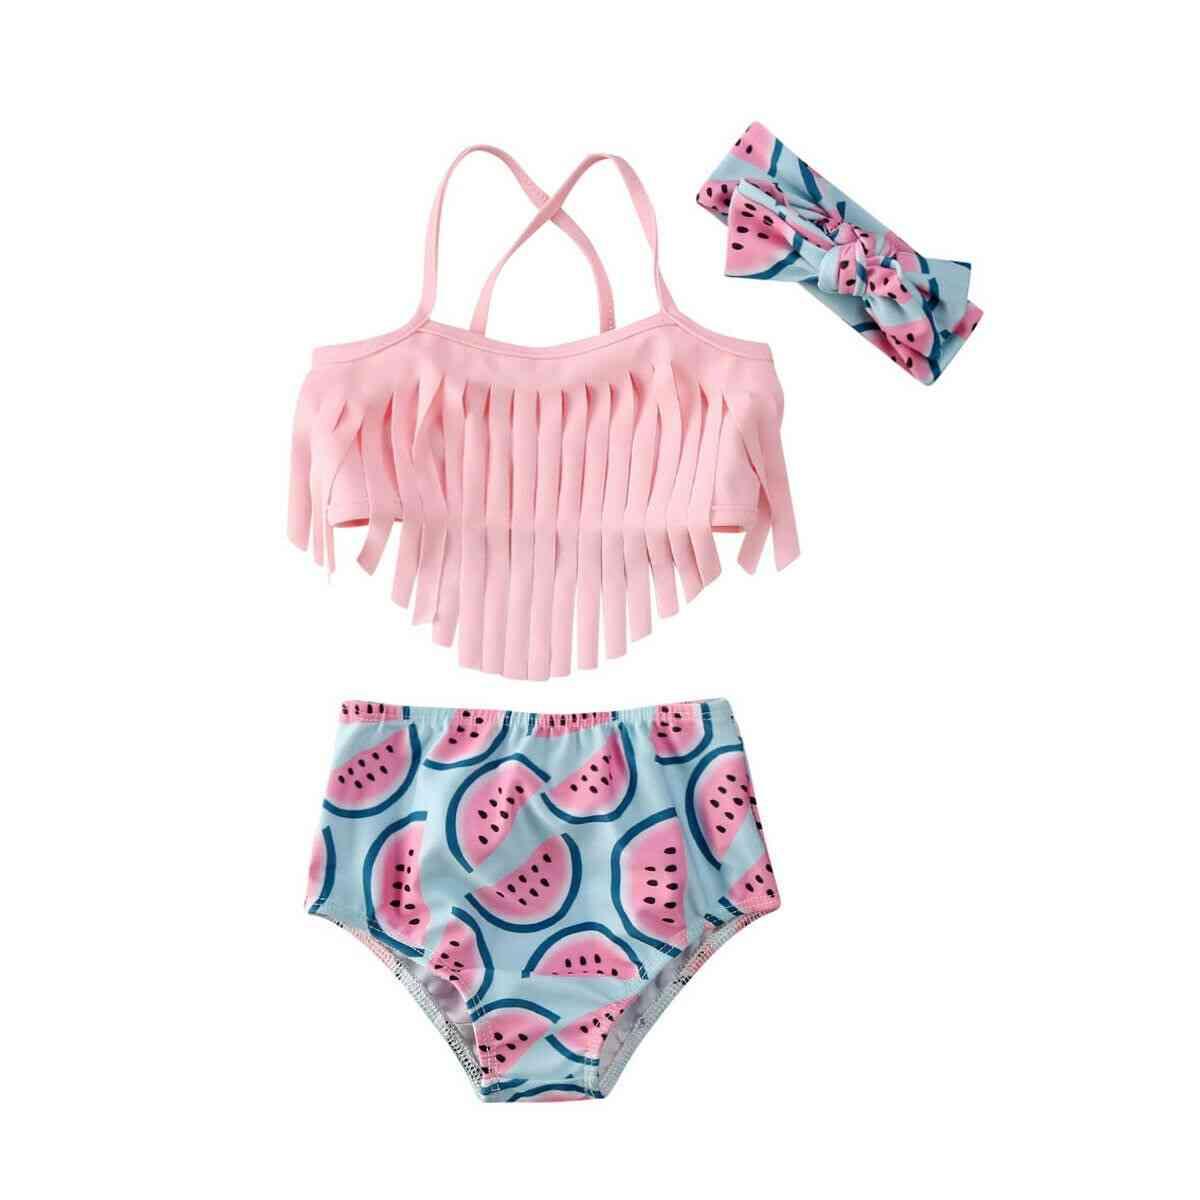 Baby Girl Swimwear Tassel Watermelon Swimsuit, Beach Bathing Girl Swimsuits